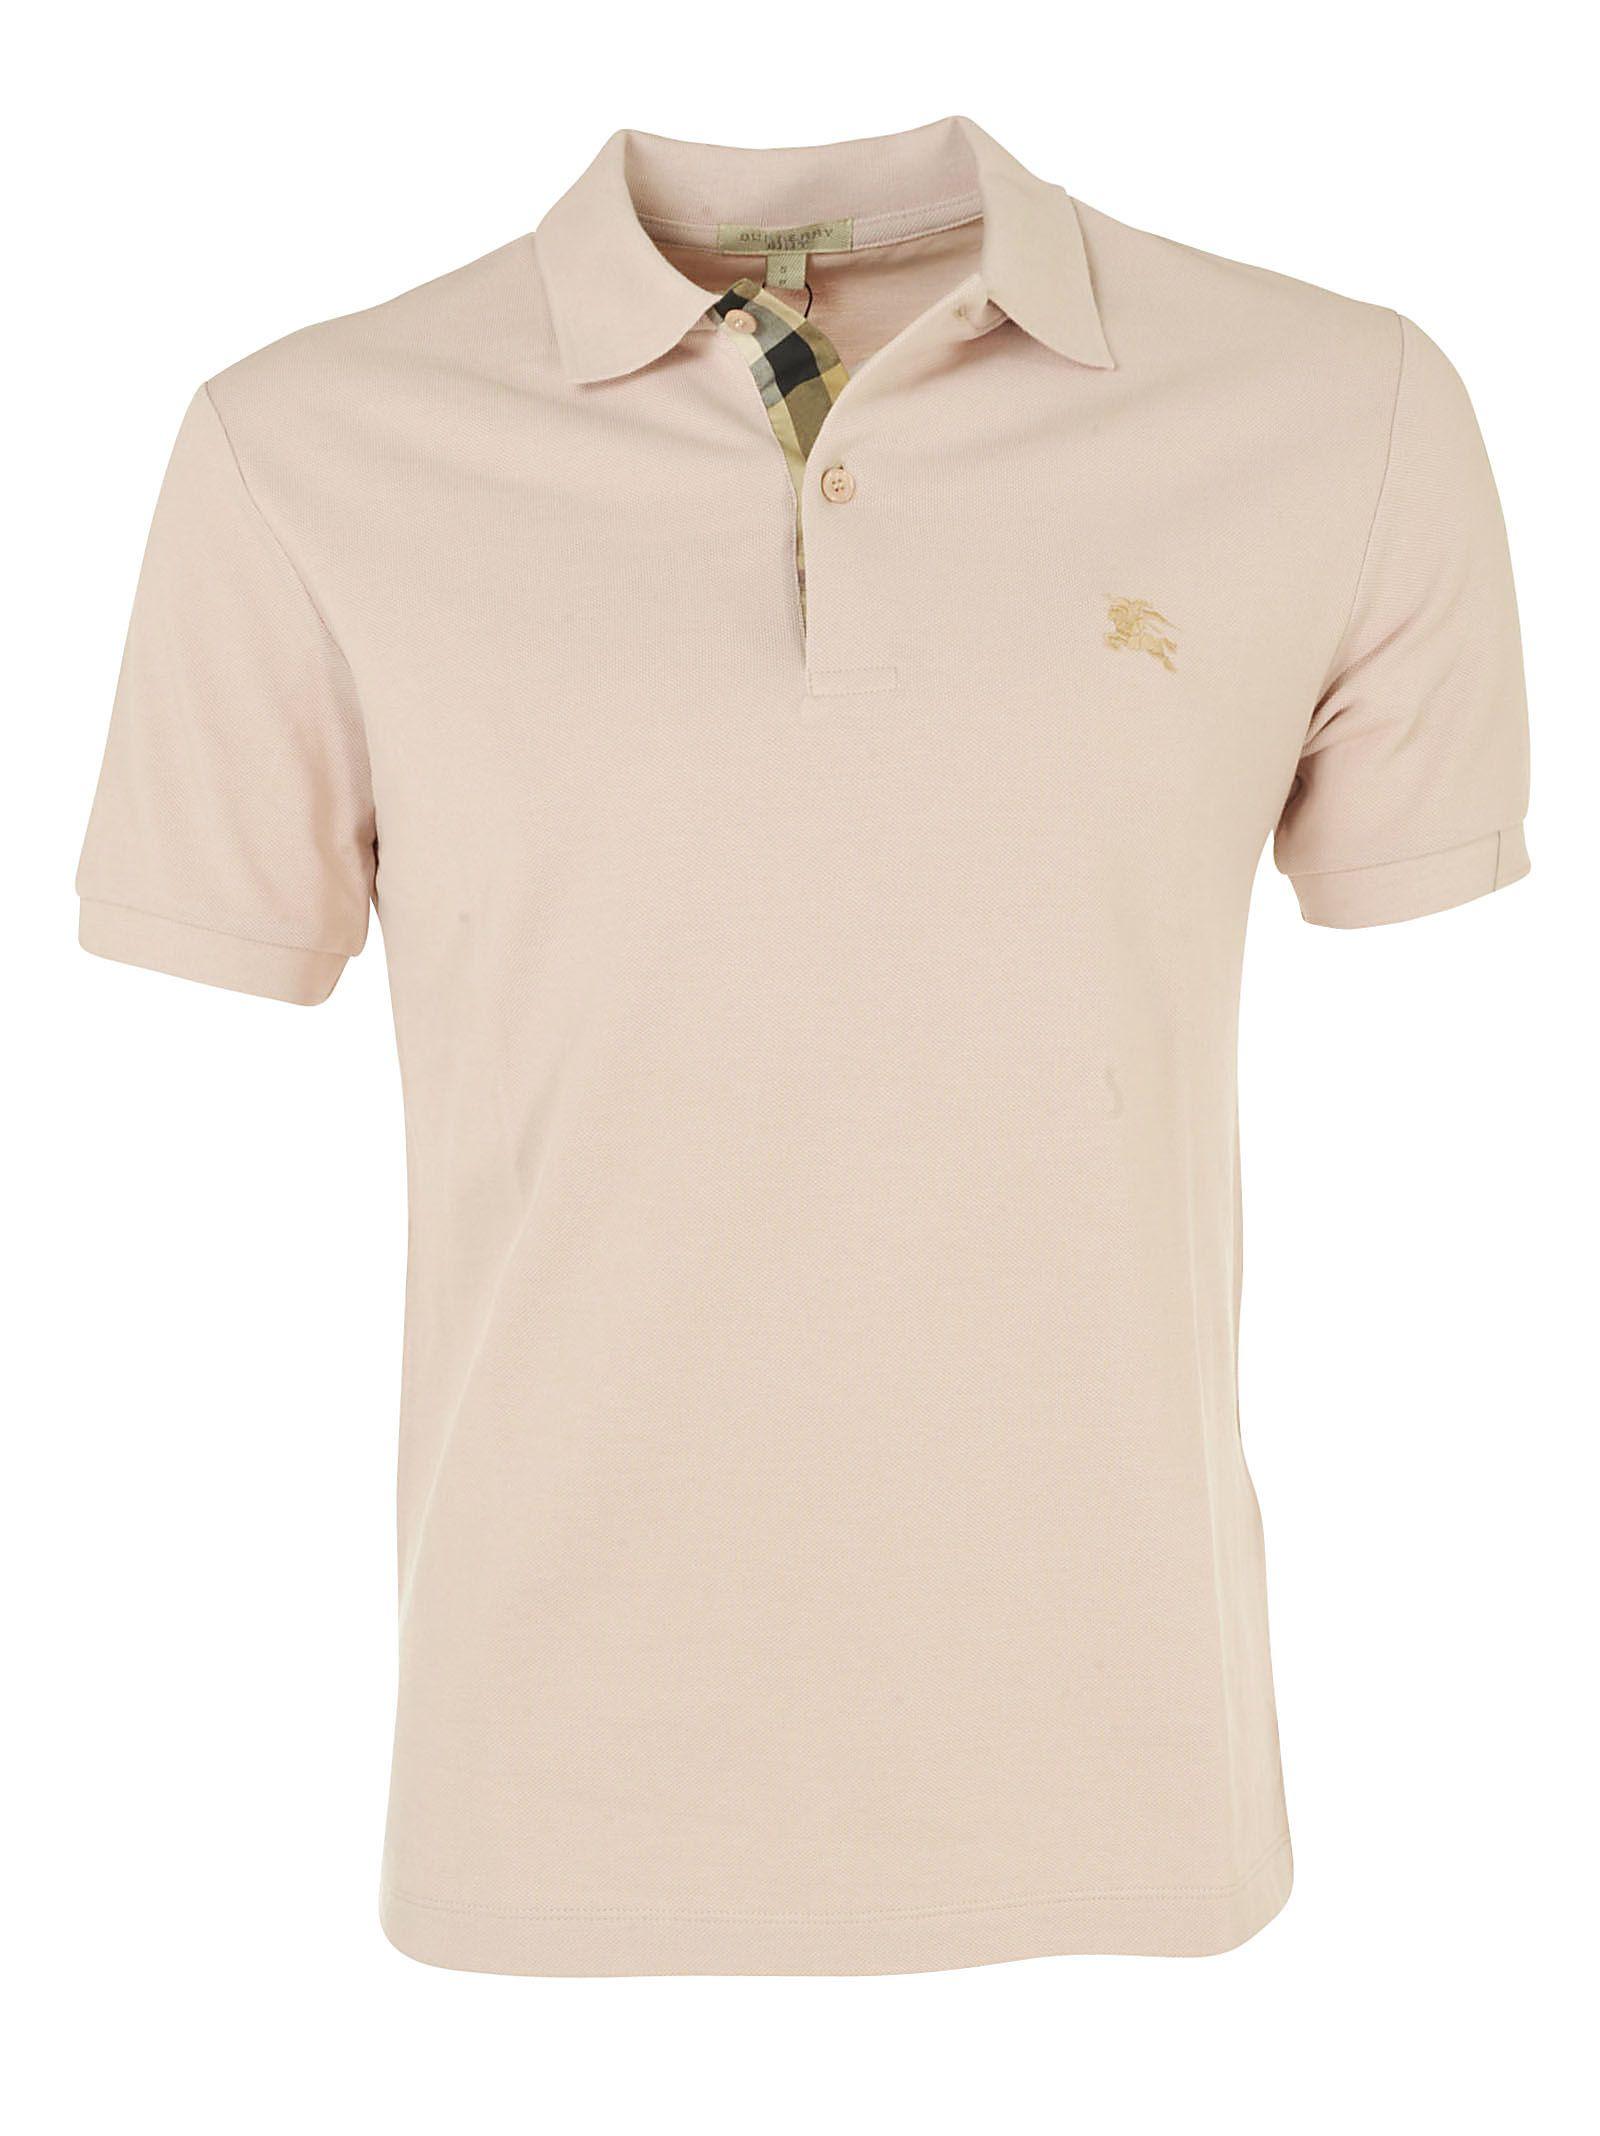 Burberry Brit Burberry Brit Classic Polo Shirt - Chalk Pink - 887963 ... 56f47c87c22